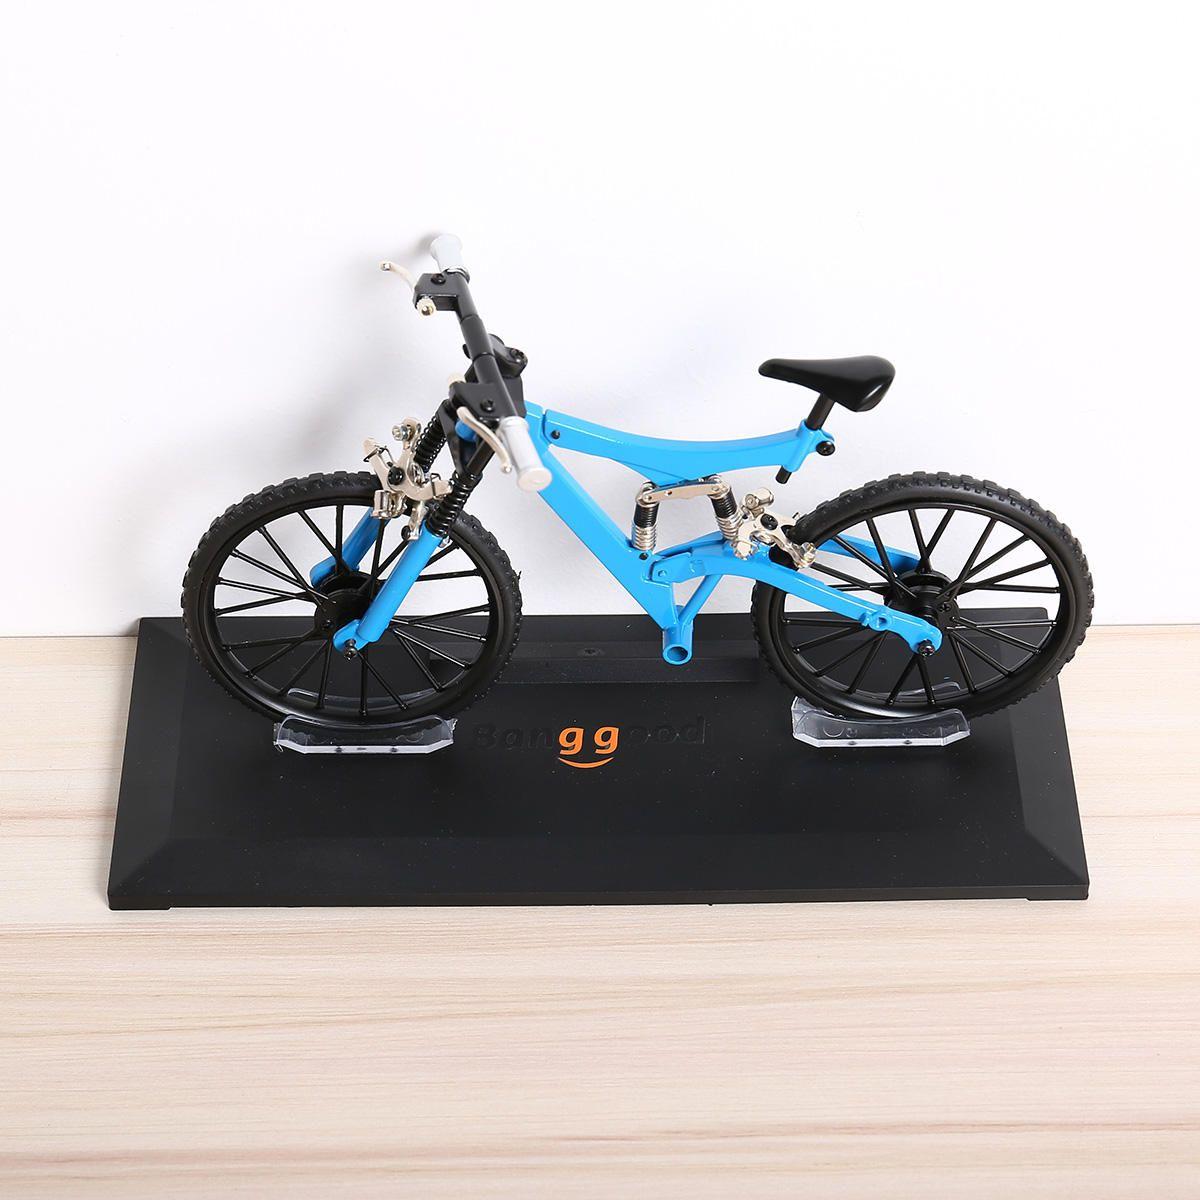 Banggood Bicycle Model Simulation DIY Alloy Mountain/Road Bicycle Set Decoration Gift Model Toys